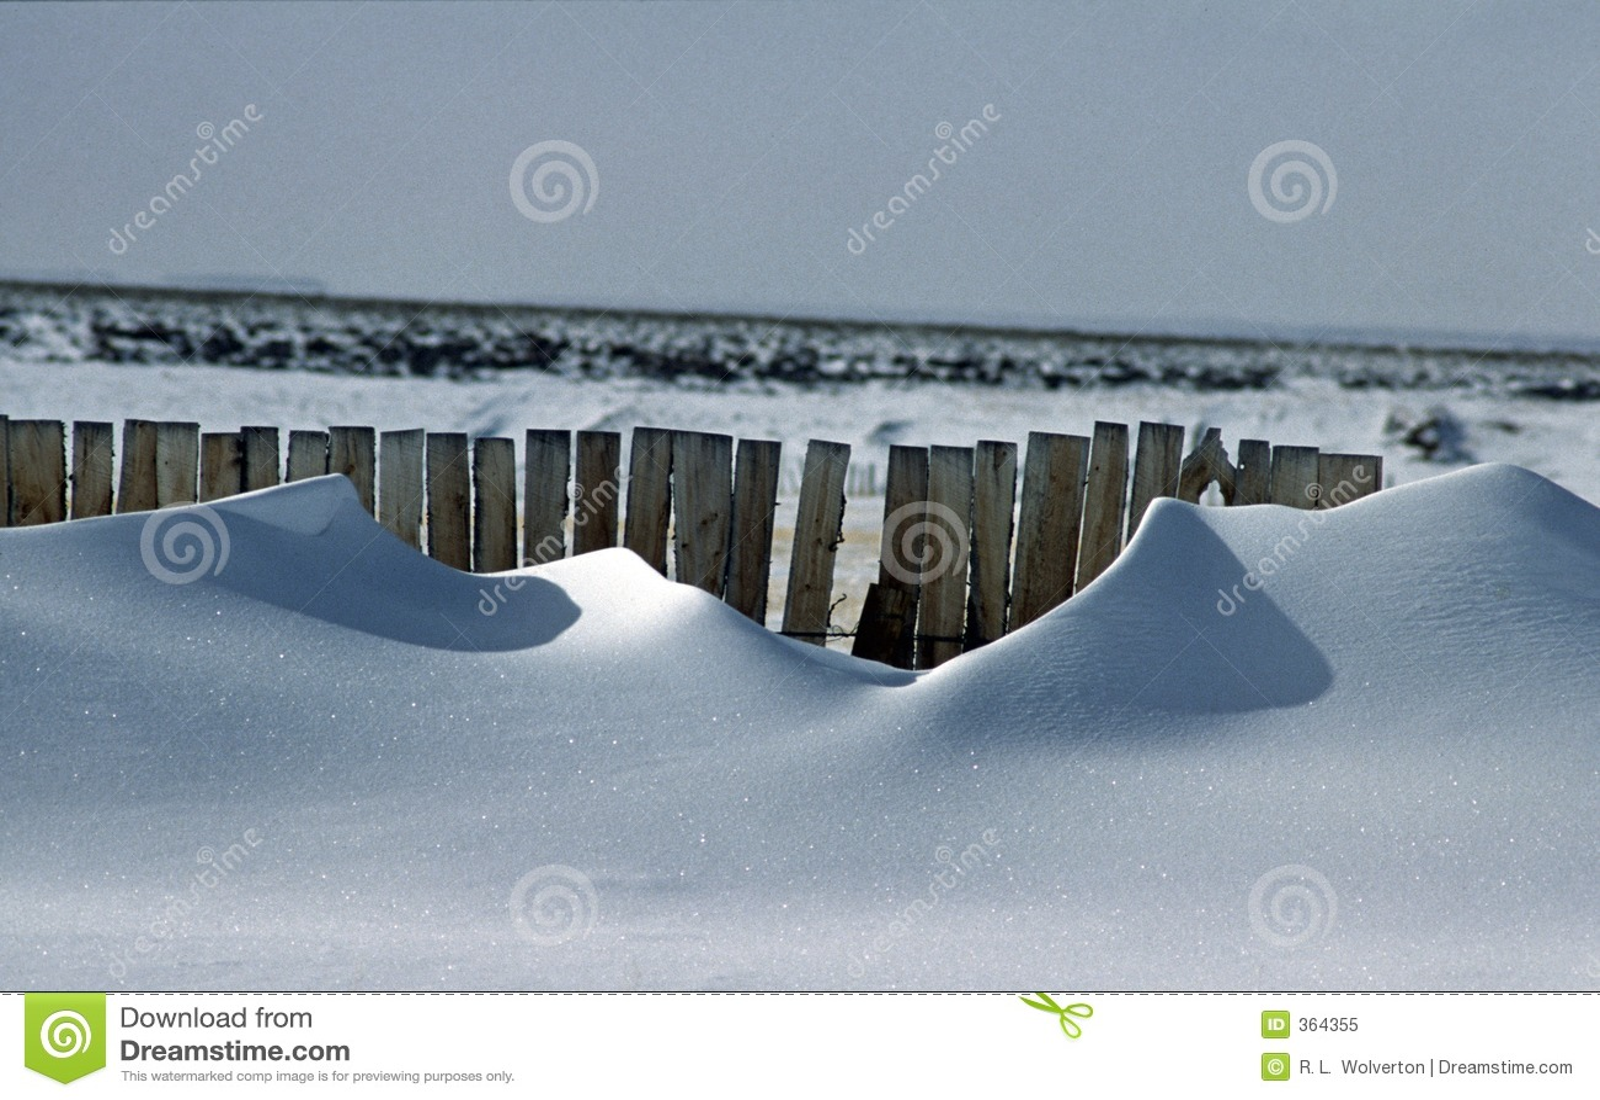 1 за снежком загородки смещений